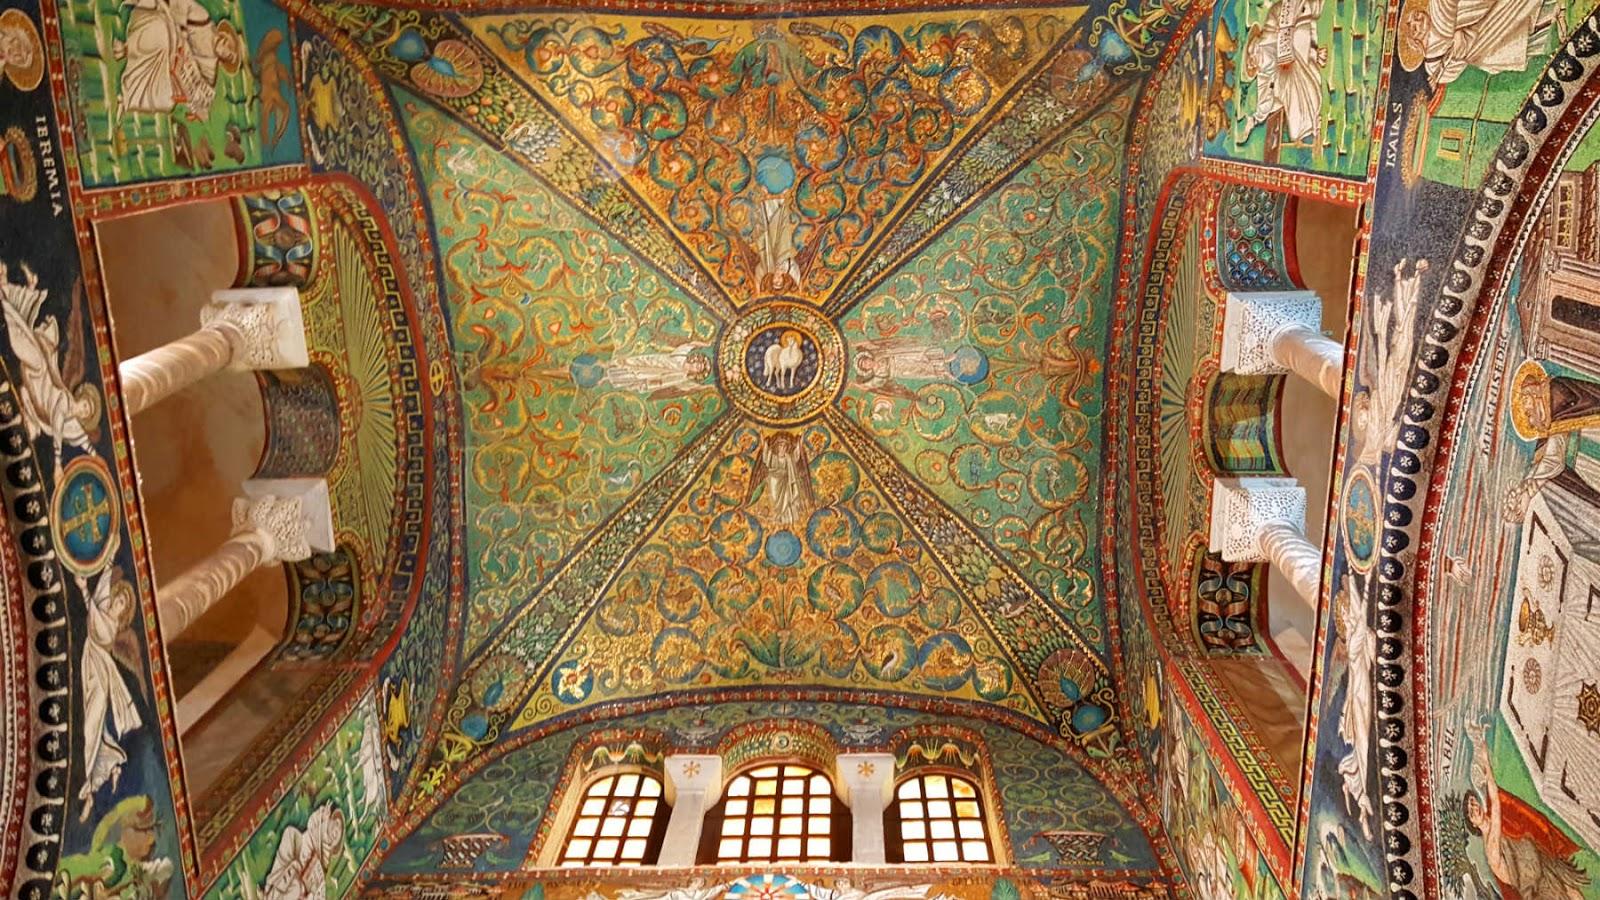 Basílica de San Vitale em Ravenna, Itália.